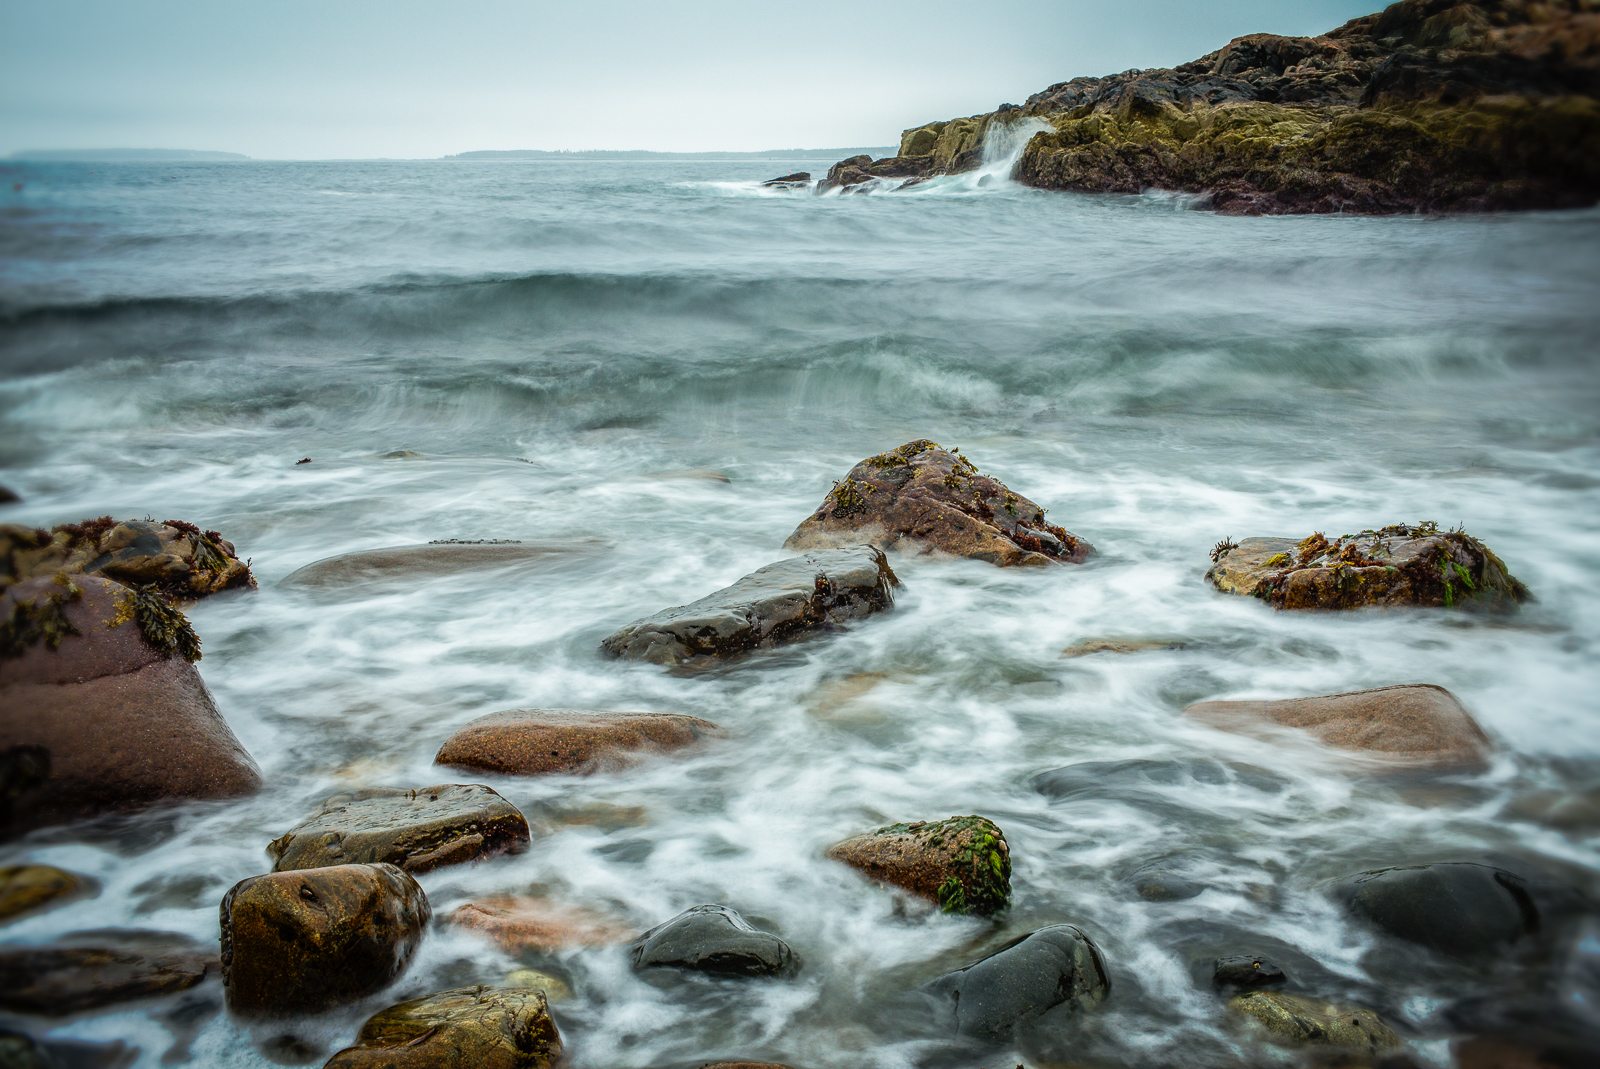 Acadia, Little Hunter's Beach, coast, waves, rocks, fog, new england